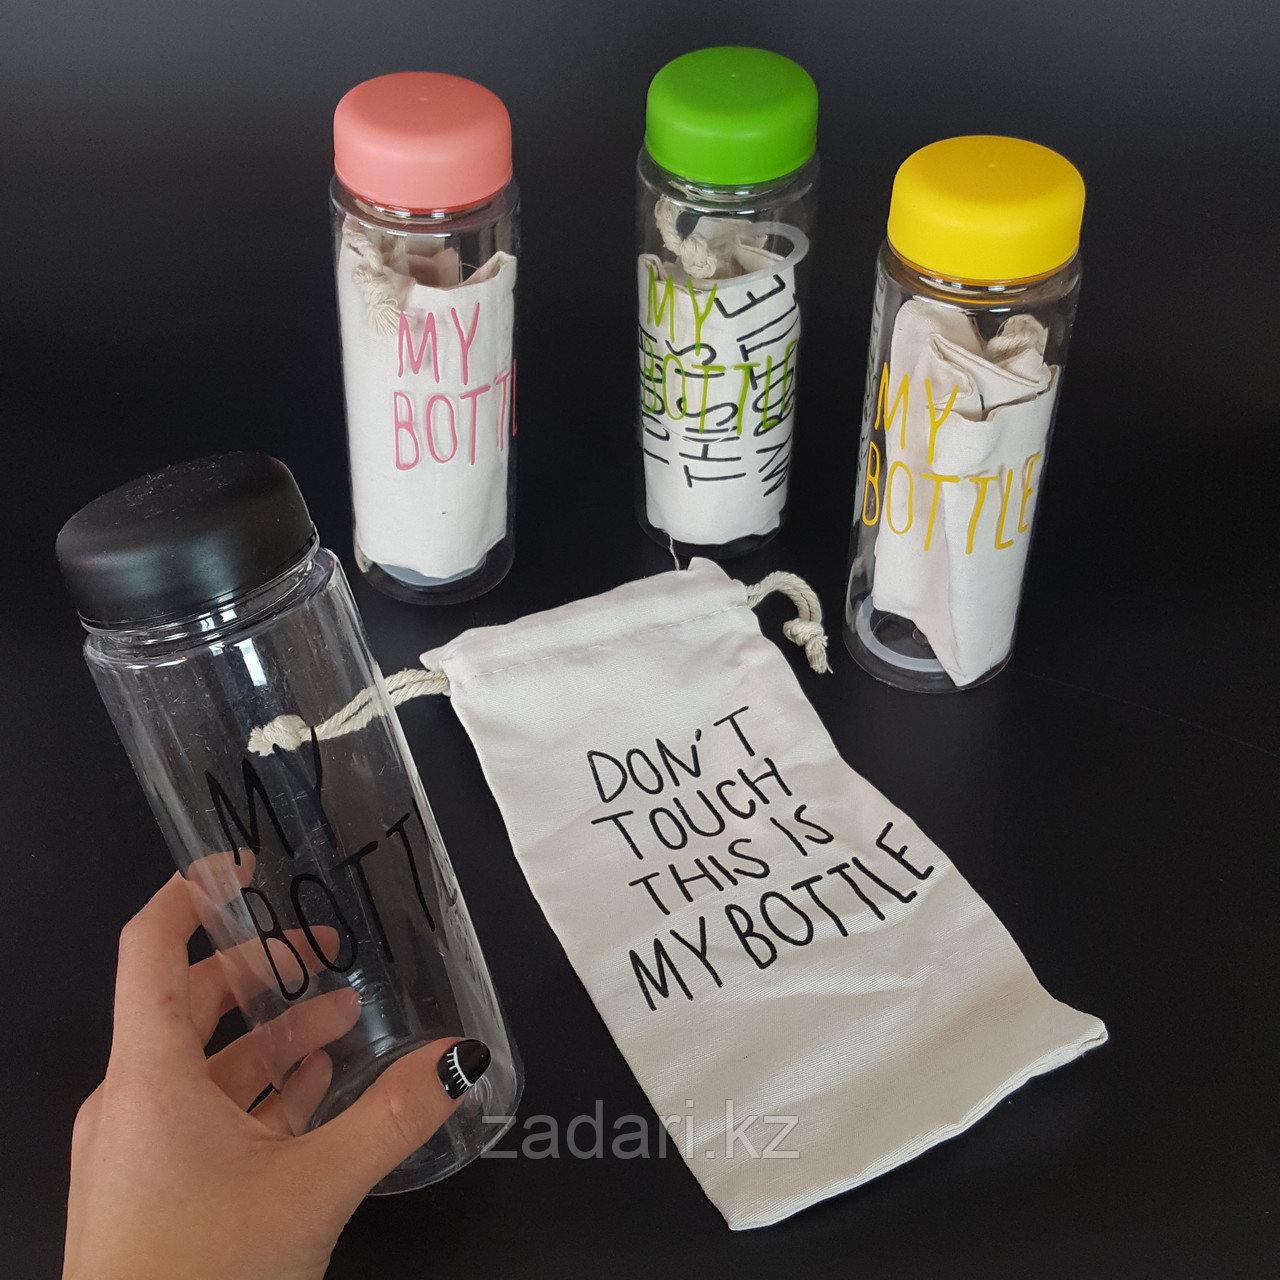 Бутылка «My Bottle» пластиковая с чехлом